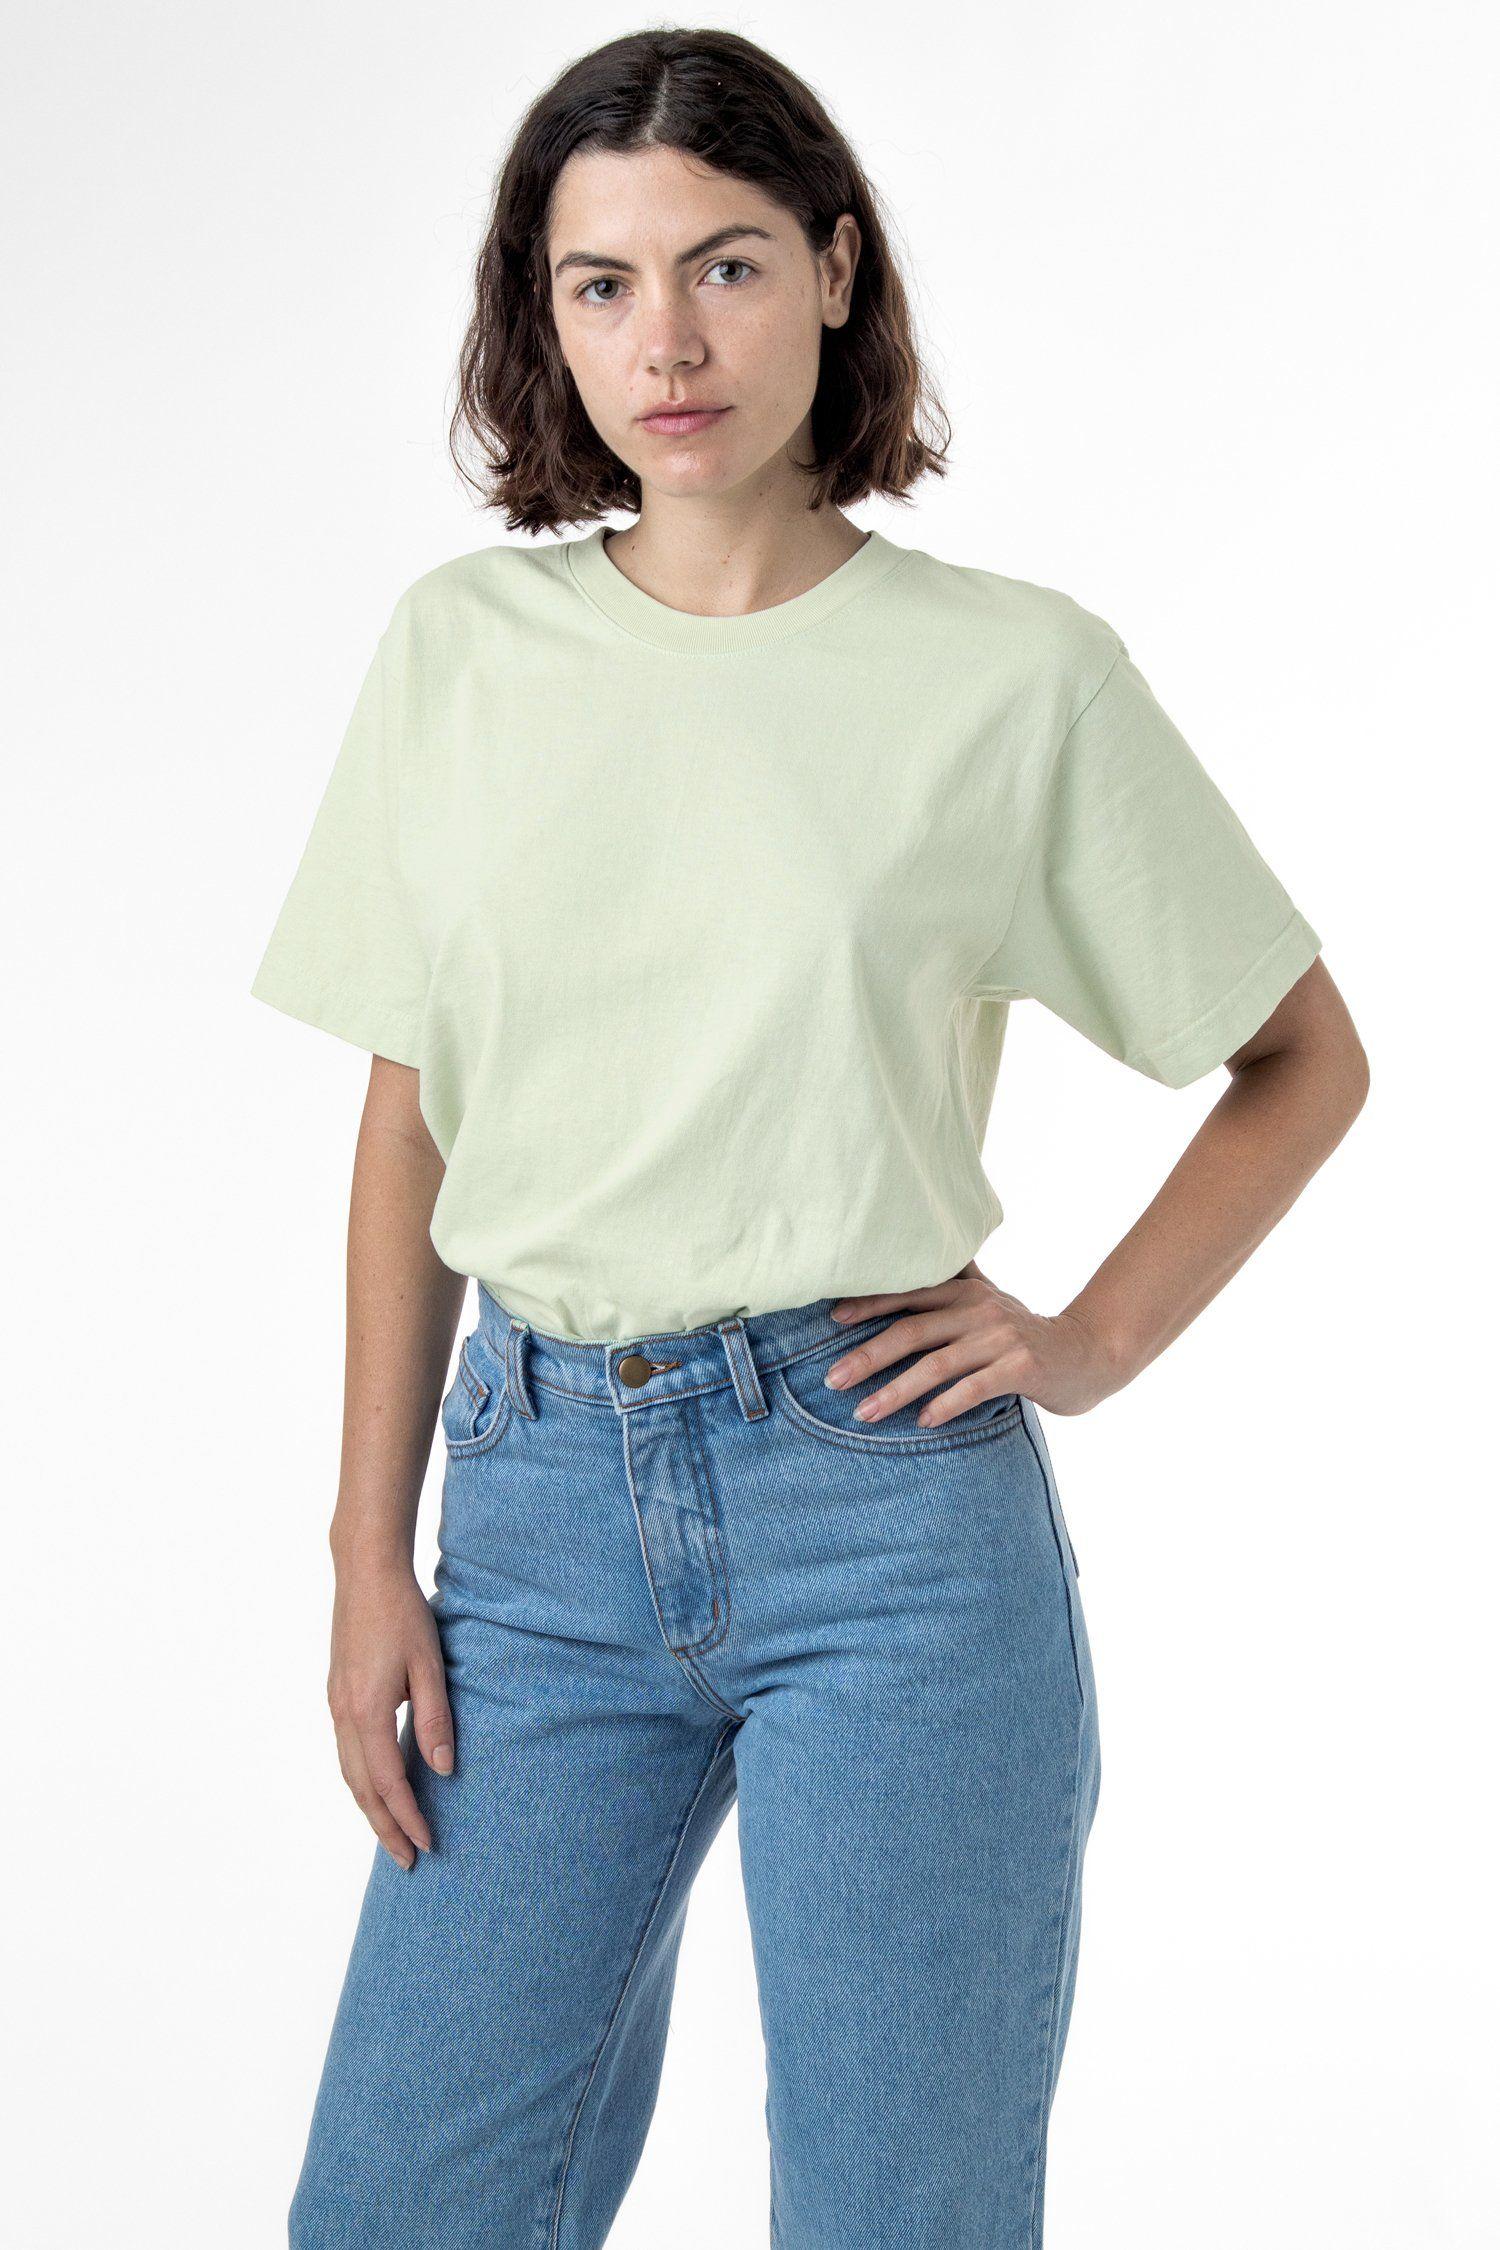 1801gd Unisex 6 5oz Garment Dye Pastel Crew Neck T Shirt Garment Dye Sweaters And Leggings Garment